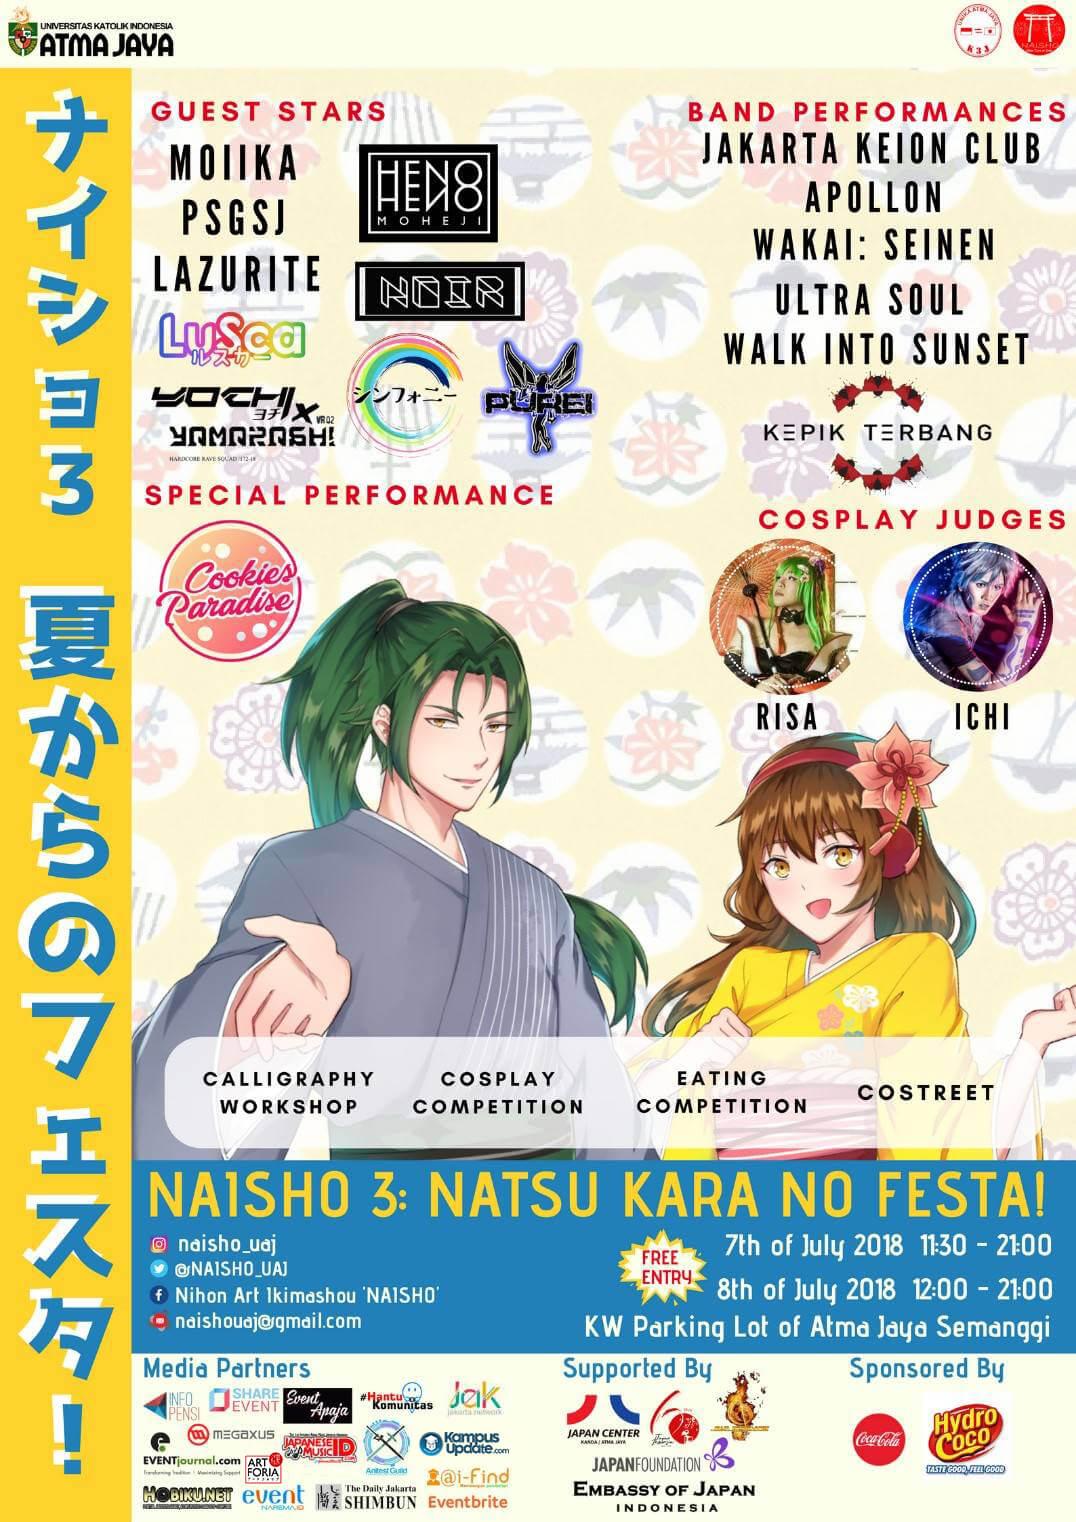 Festival Musim Panas Jepang Dalam NAISHO 3 Natsu Kara No Festa